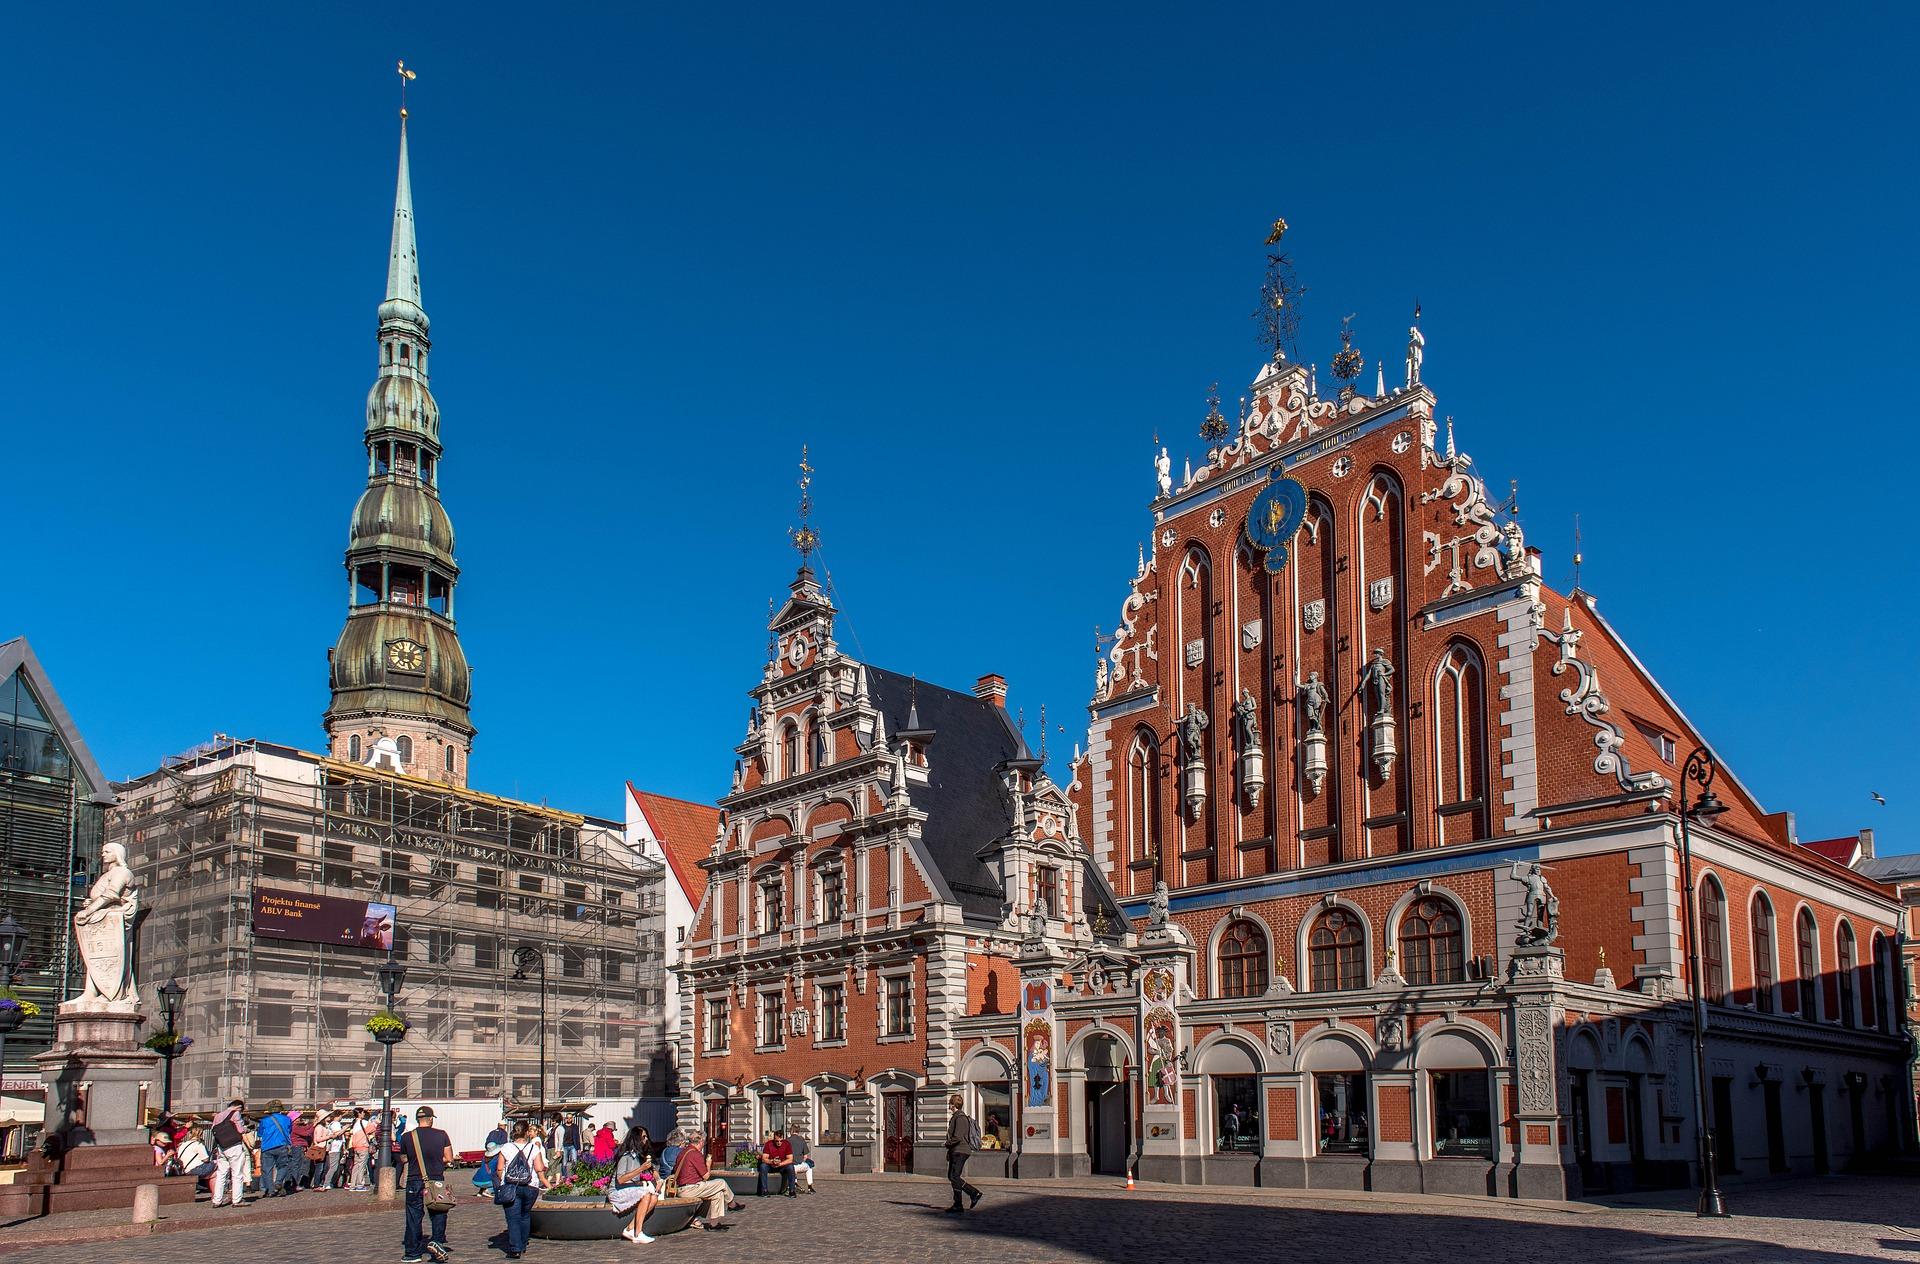 Riga_EVJF_CC0.jpg?1544809864